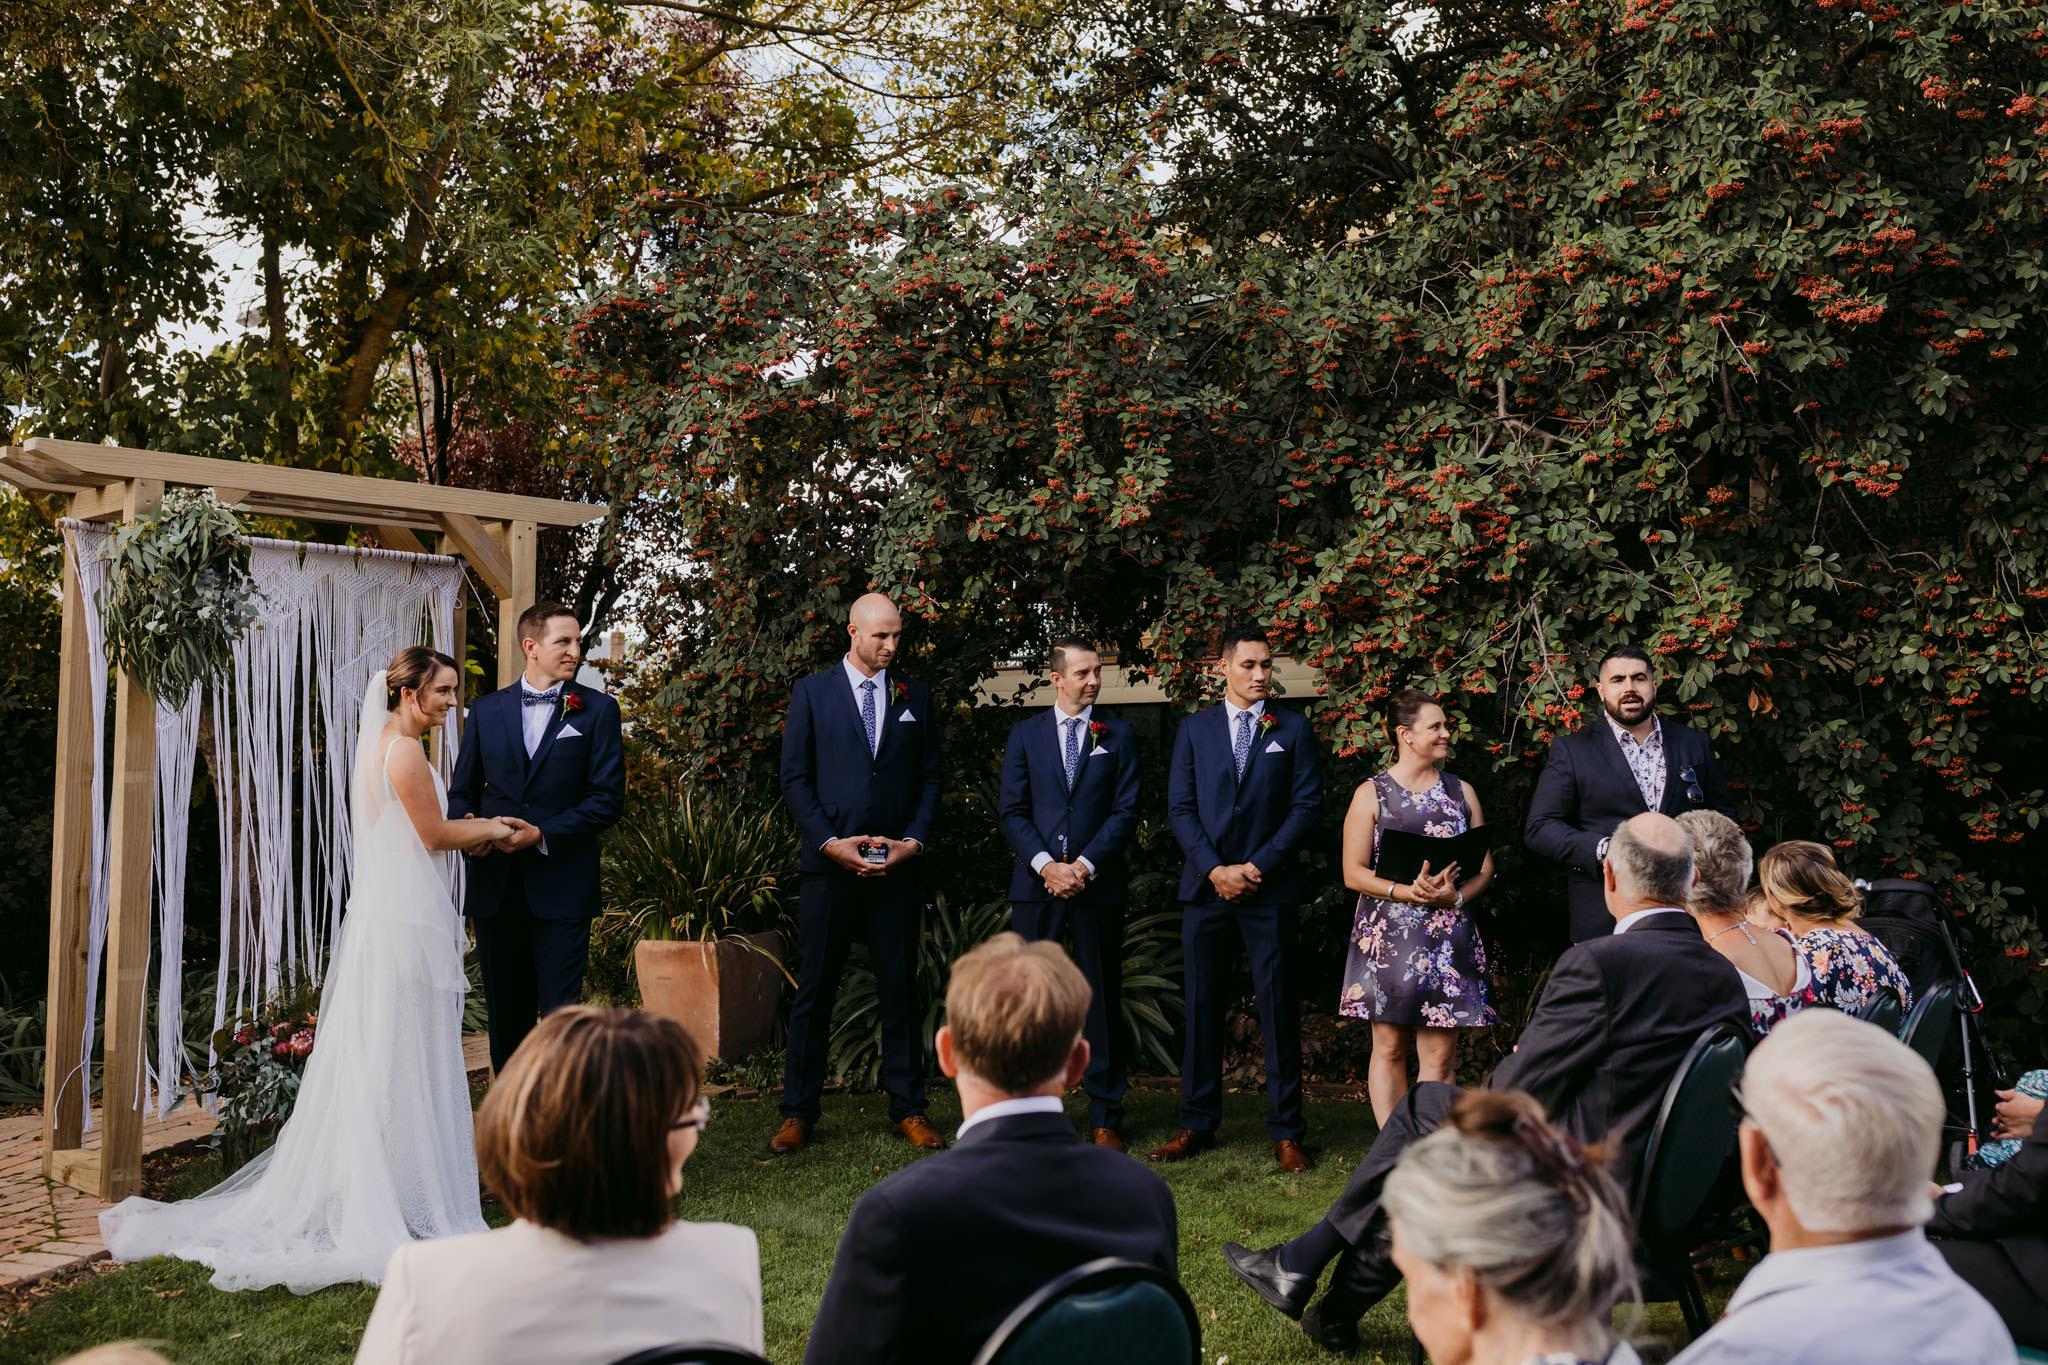 Erin Latimore Mudgee Canberra Wedding Photographer ROSEBANK GUESTHOUSE OLD THEATRE TONIC MILLTHORPE_223.JPG